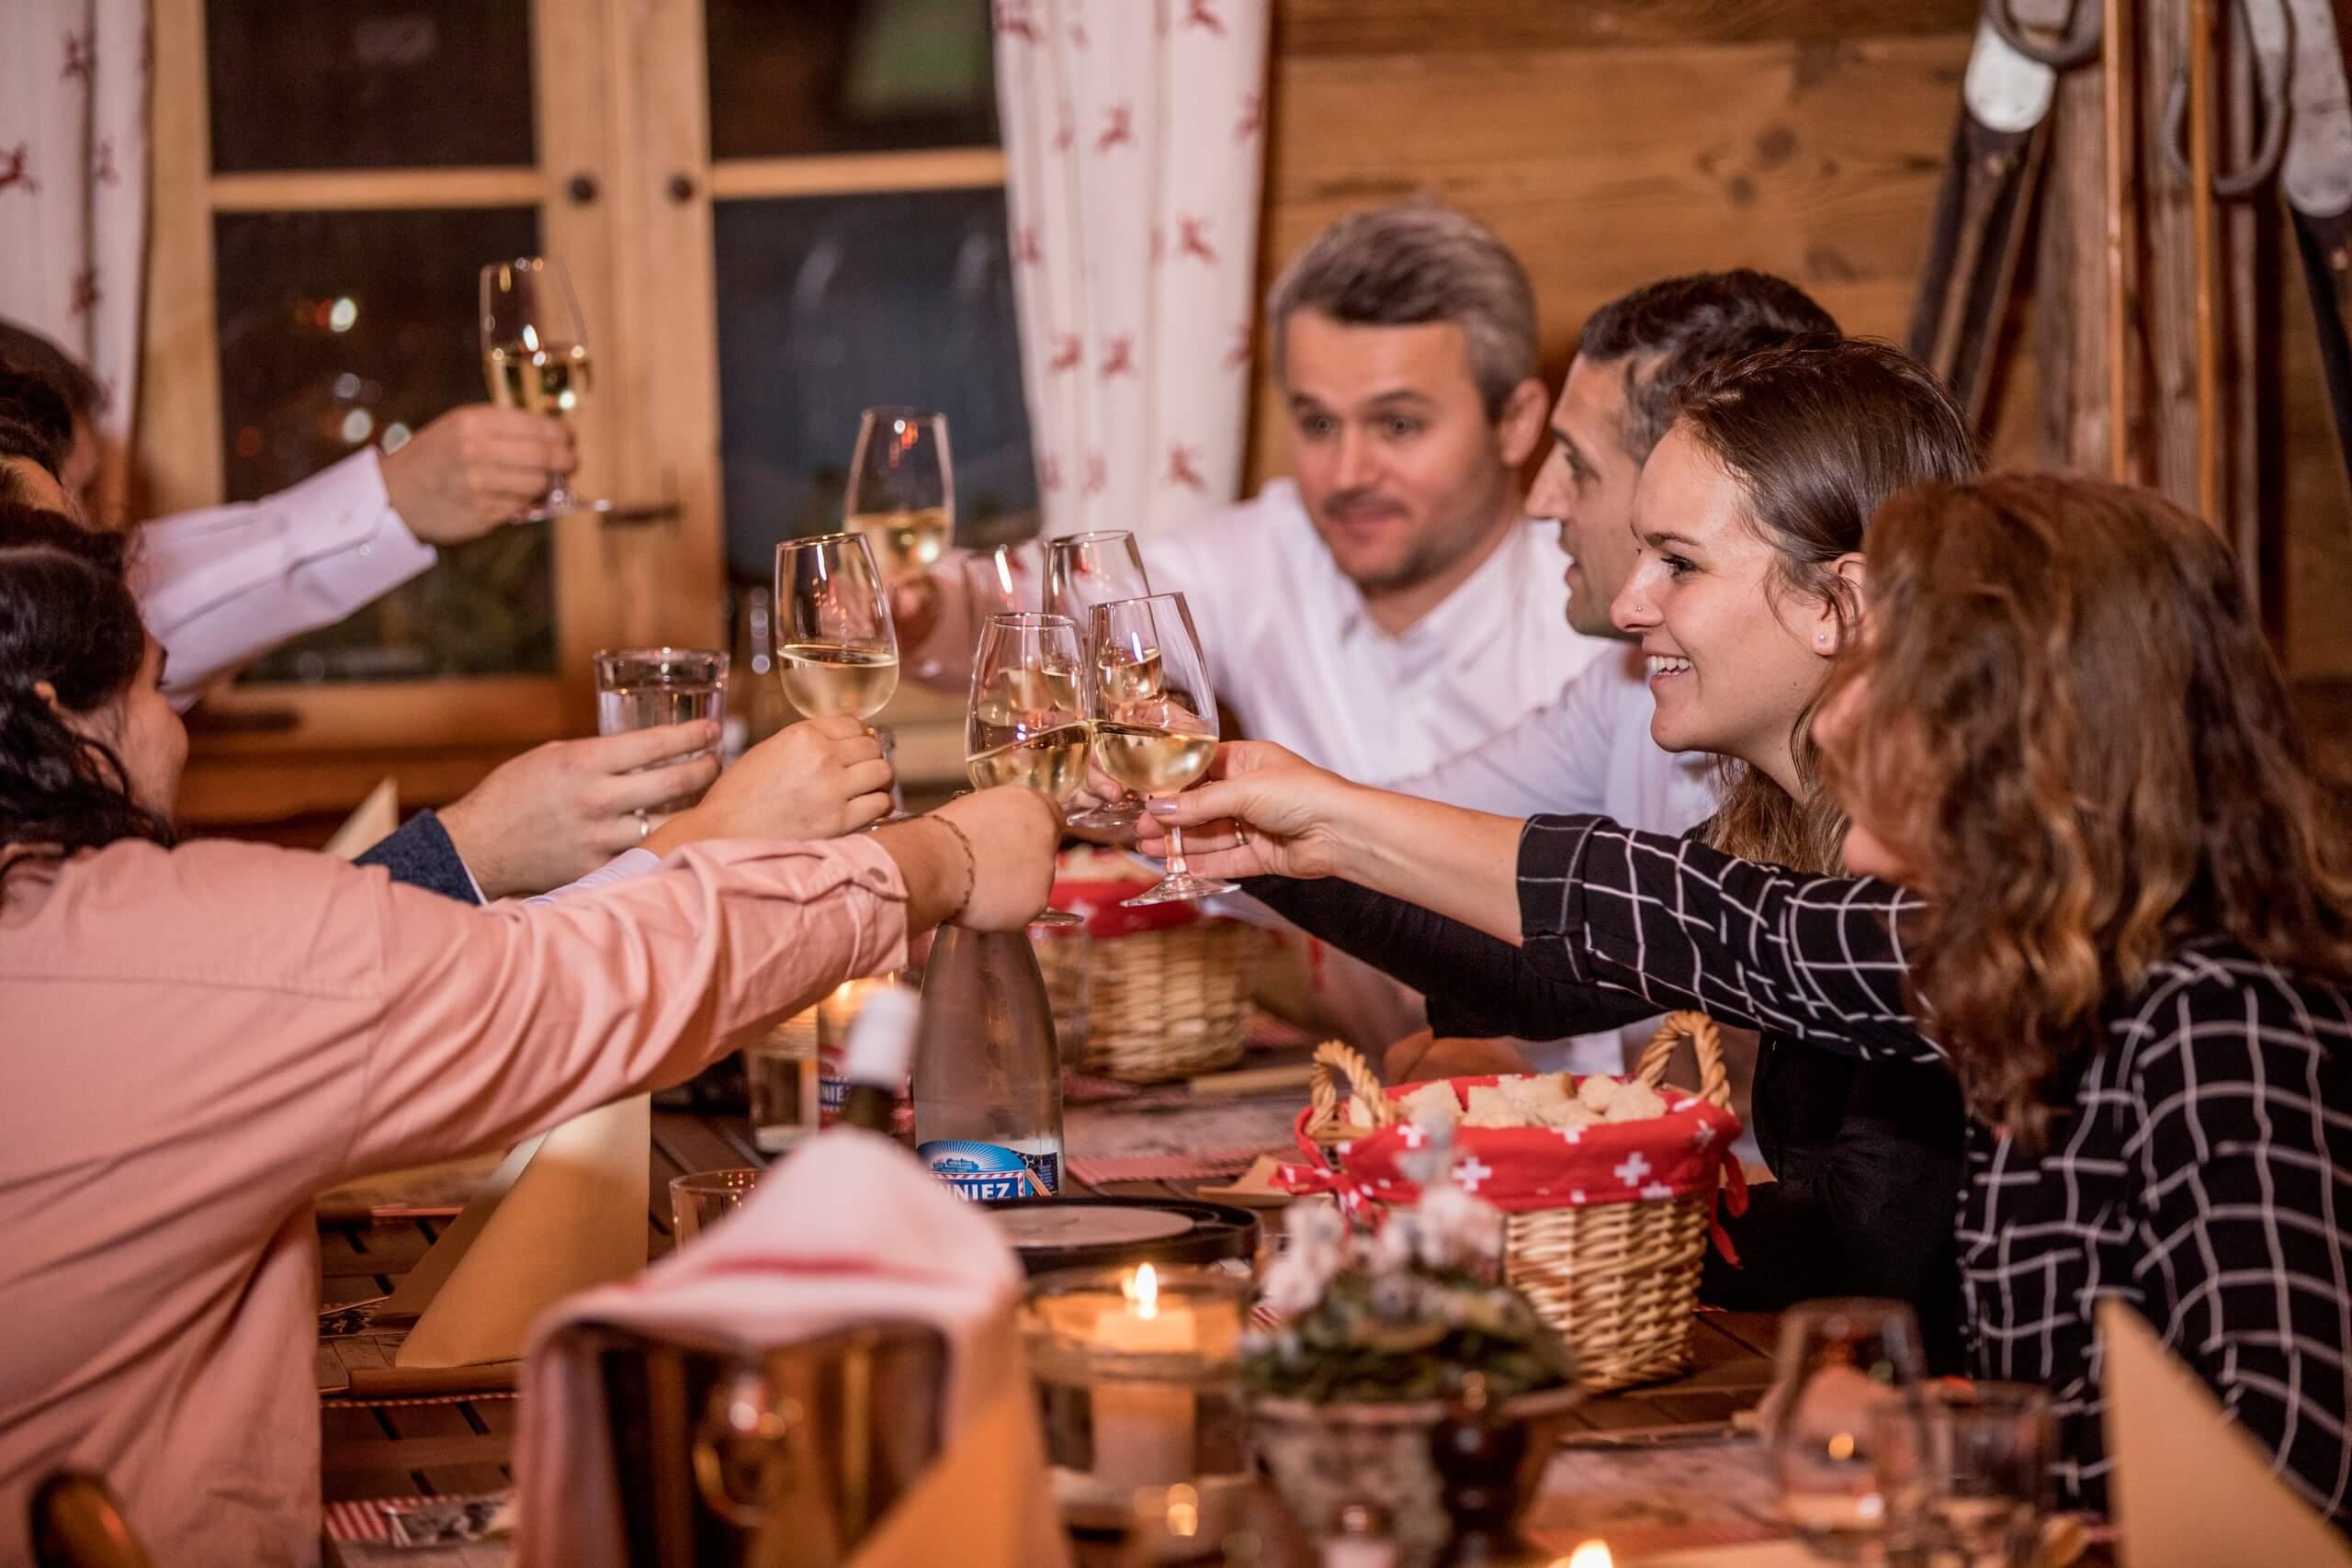 interlaken-top-of-europe-ice-magic-swiss-chalet-restaurant-fondue-wein